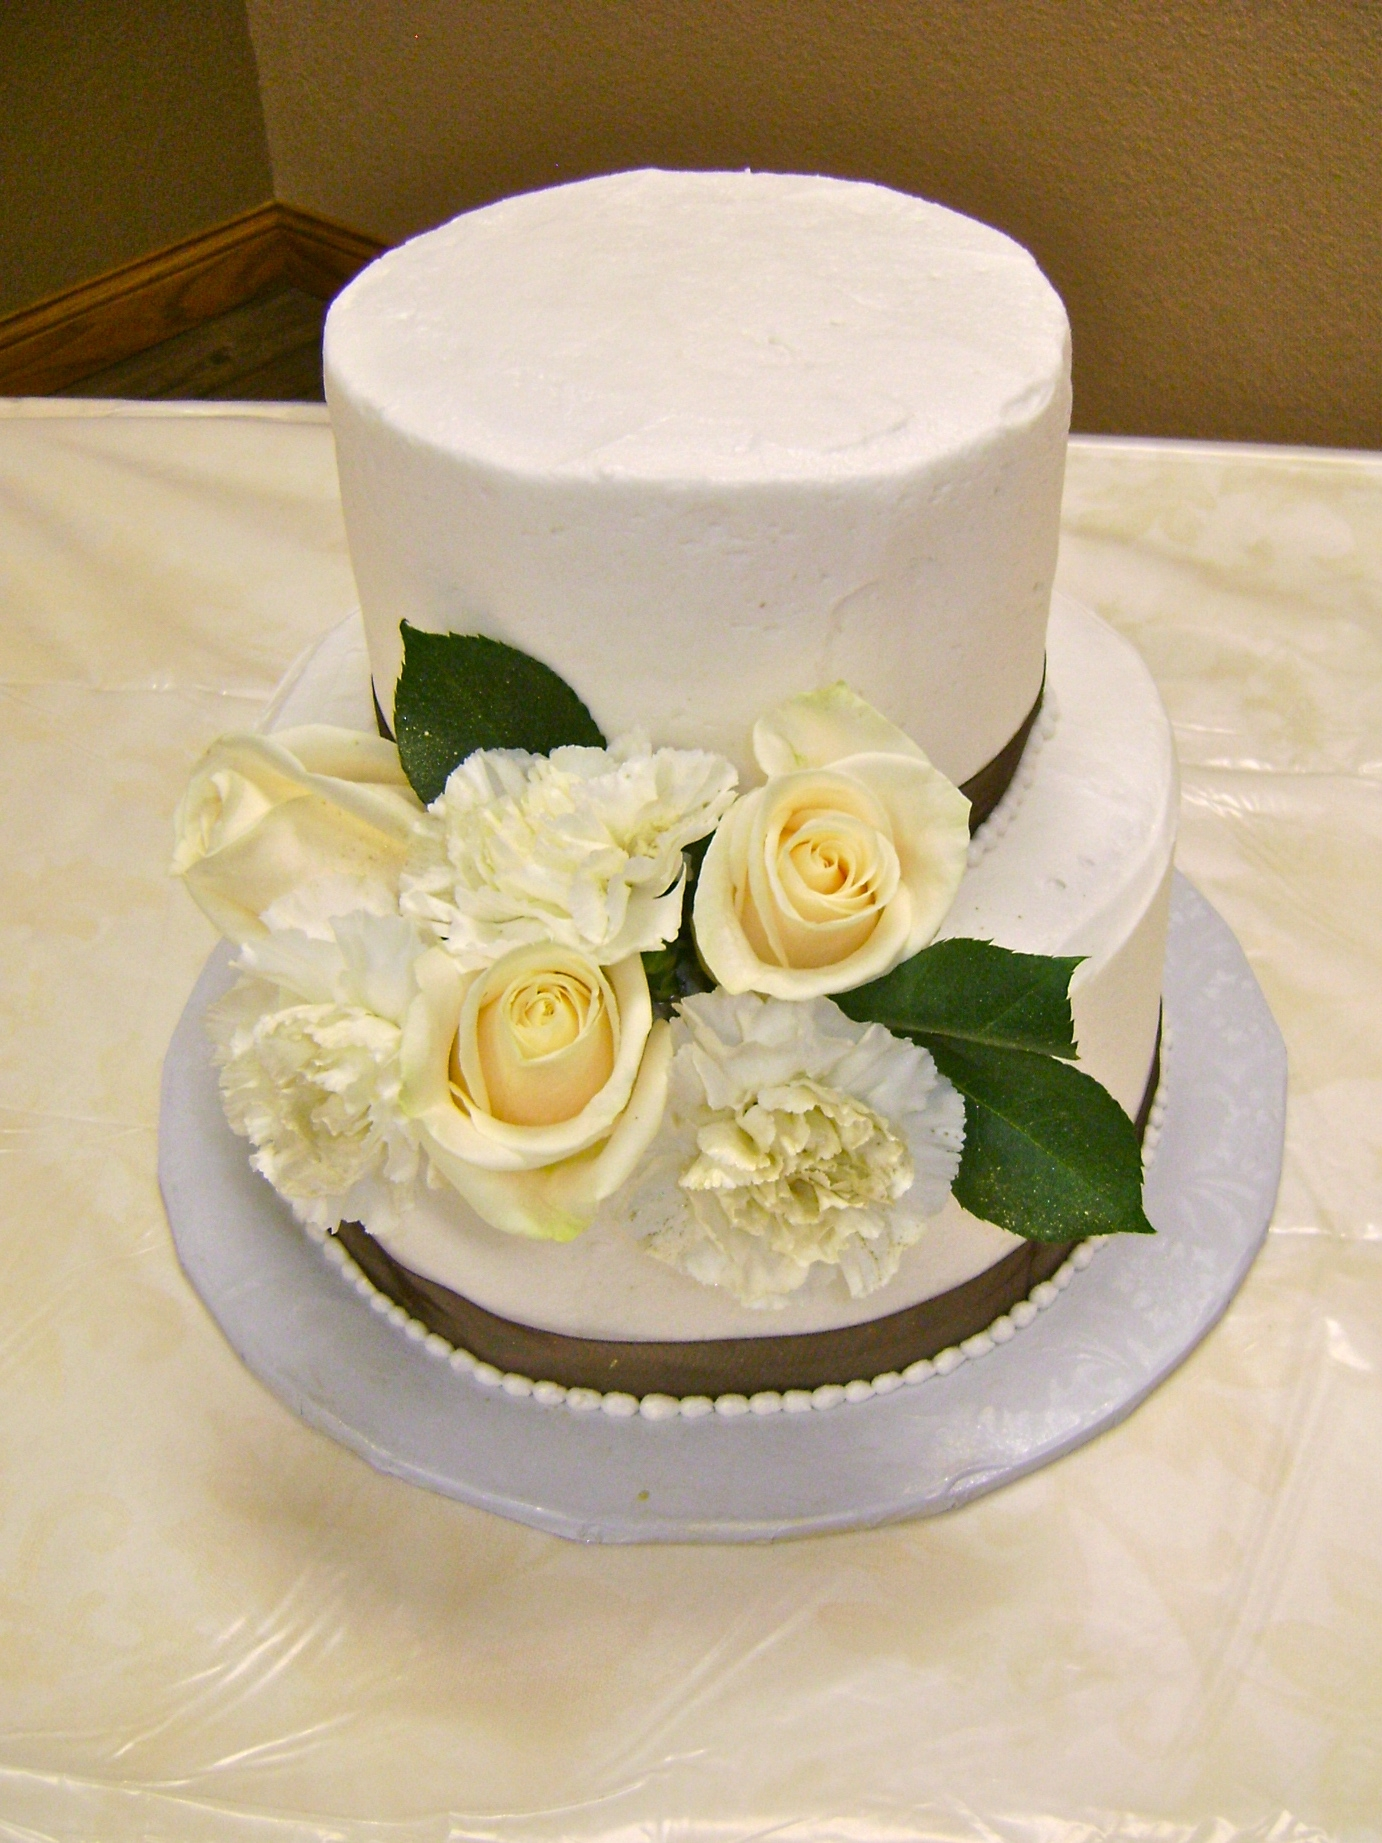 Zebra Bow Gum Paste Flowers Lacework Round Wedding Cake ...